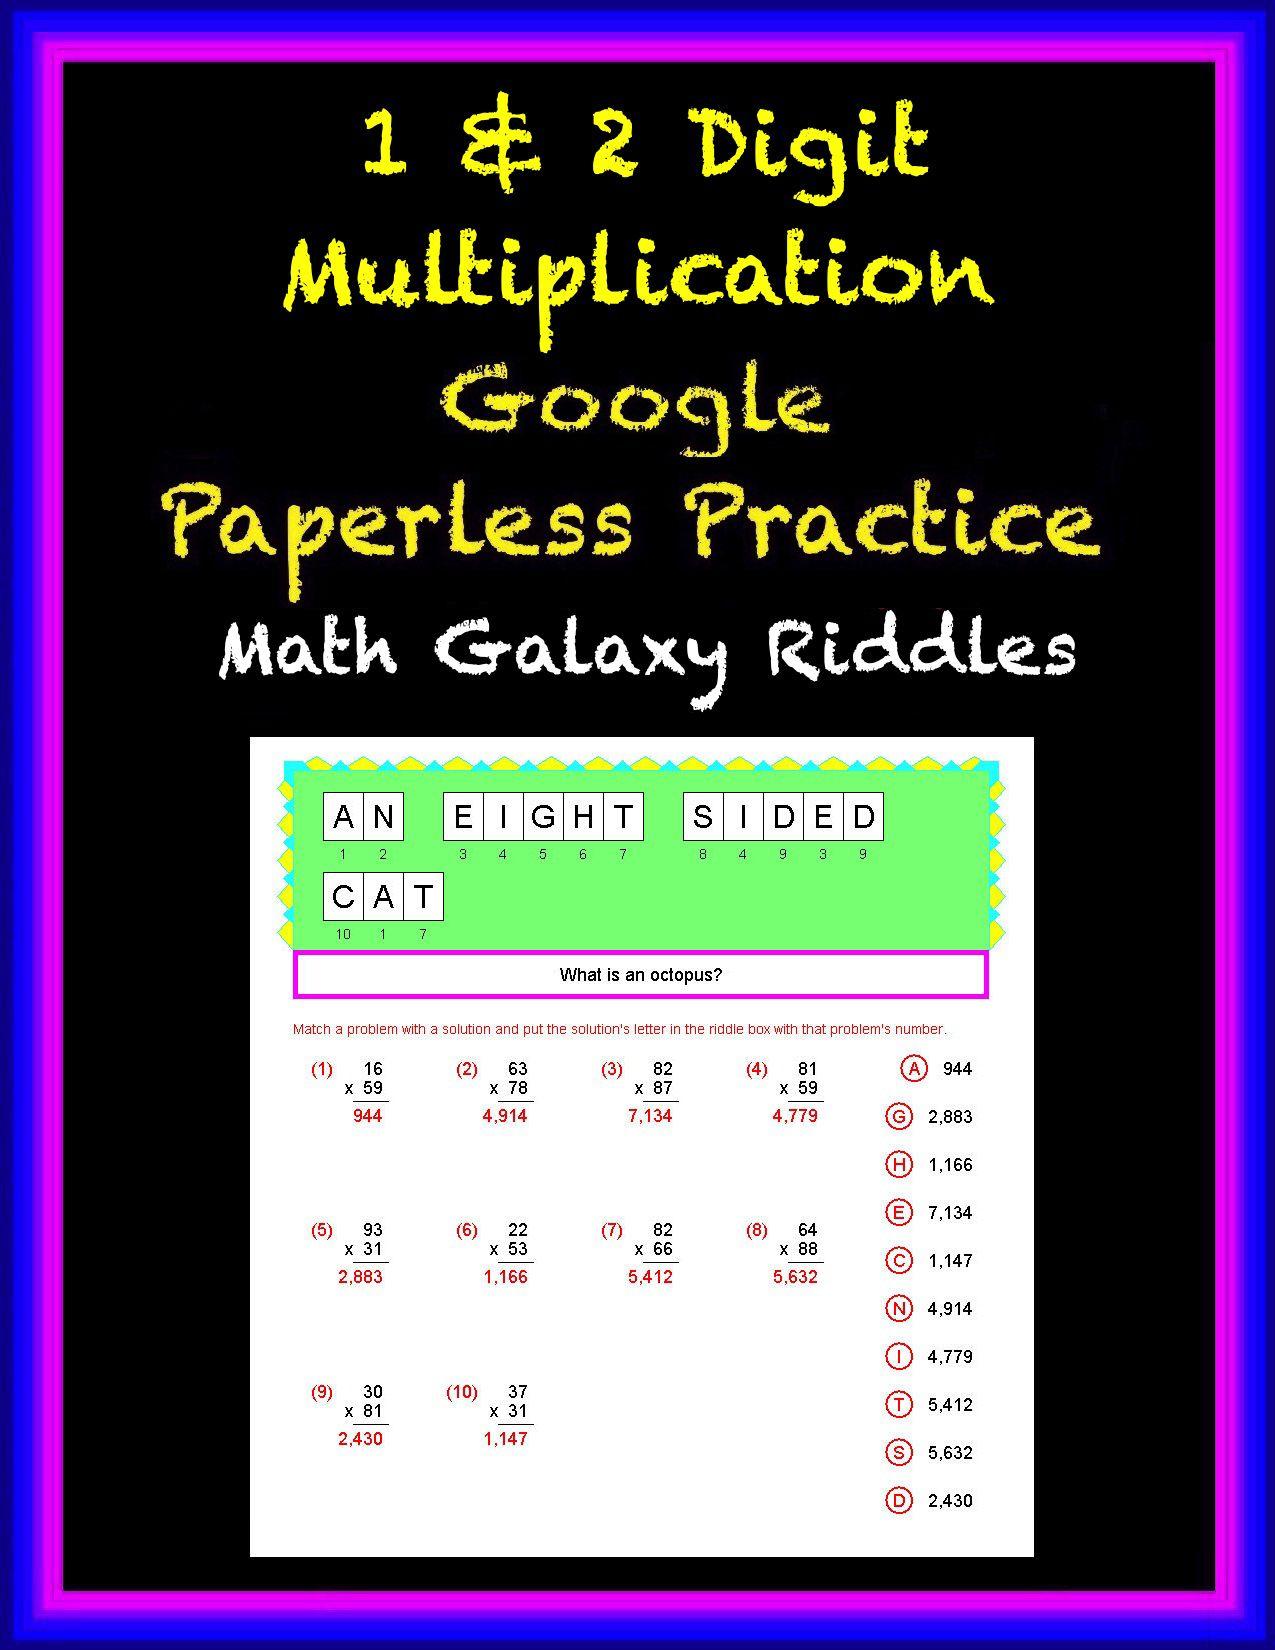 1 Amp 2 Digit Multiplication